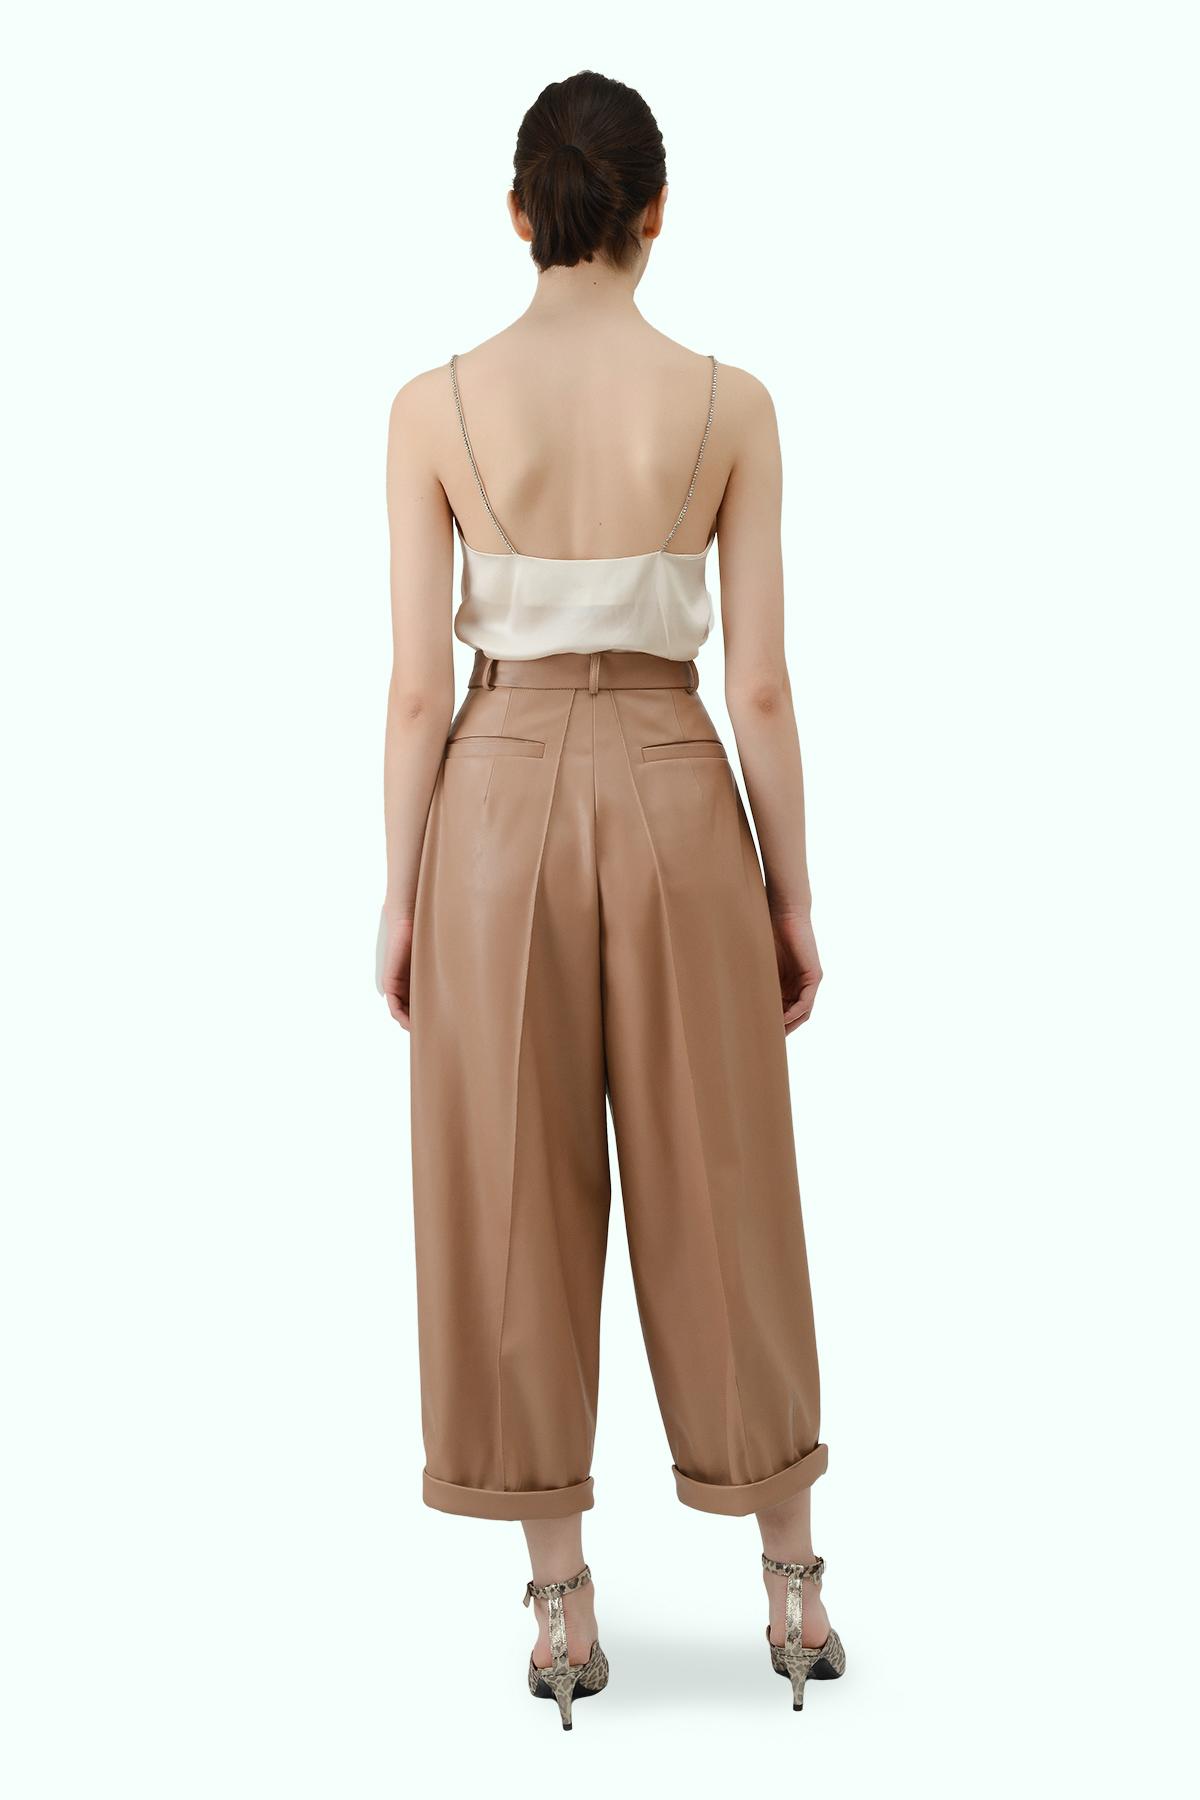 Beige vegan leather high waist wide leg cropped pants 3